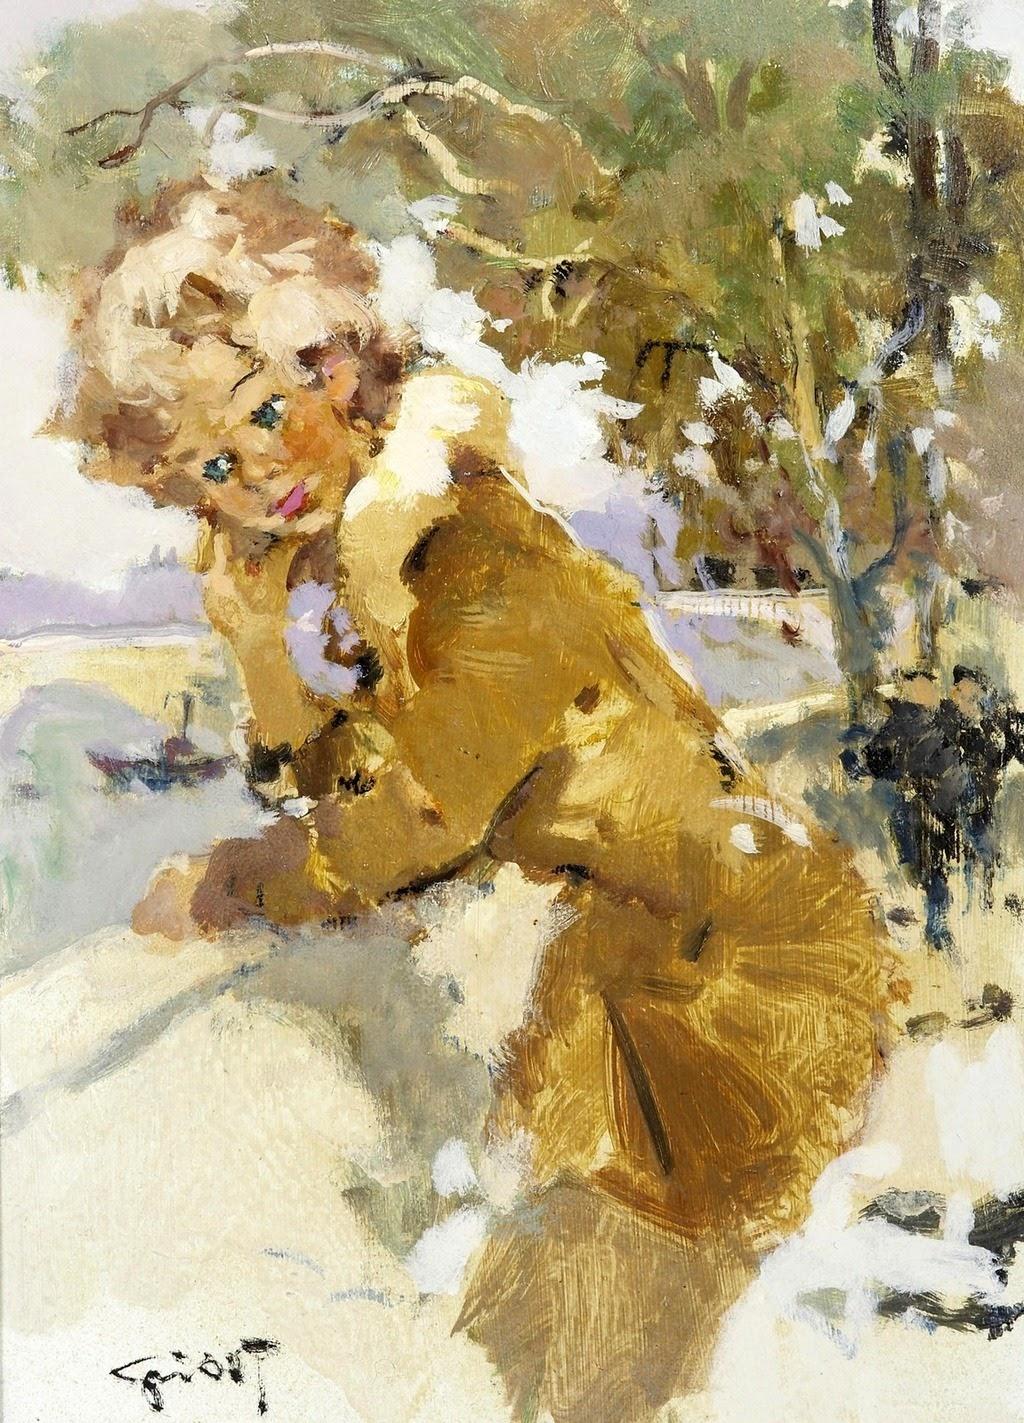 Pierre Grisot A Girl in a Fur Coat